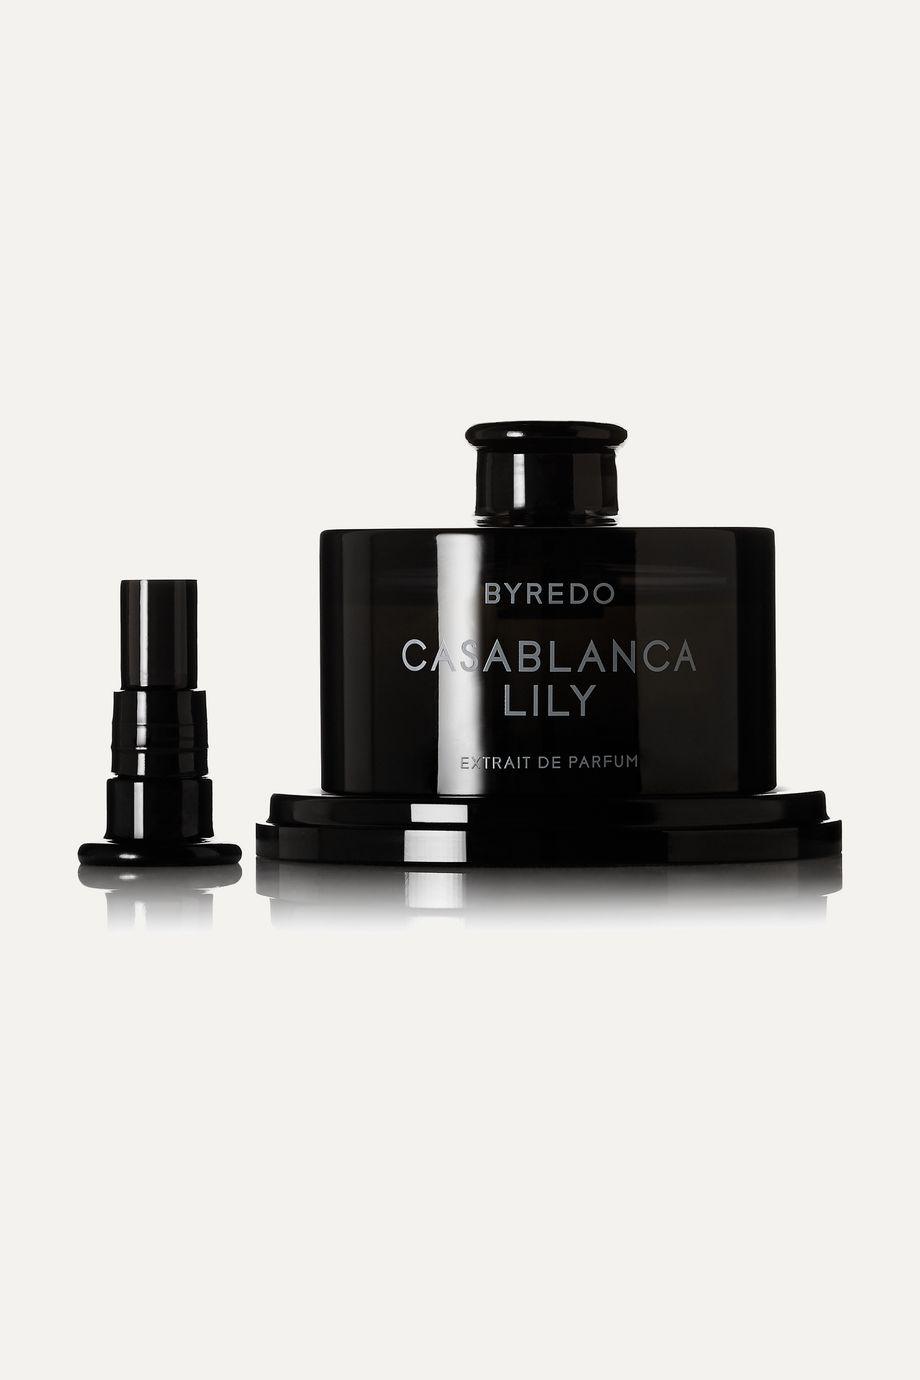 Byredo Casablanca Lily Extrait de Parfum - Black Plum & Wild Gardenia, 30ml